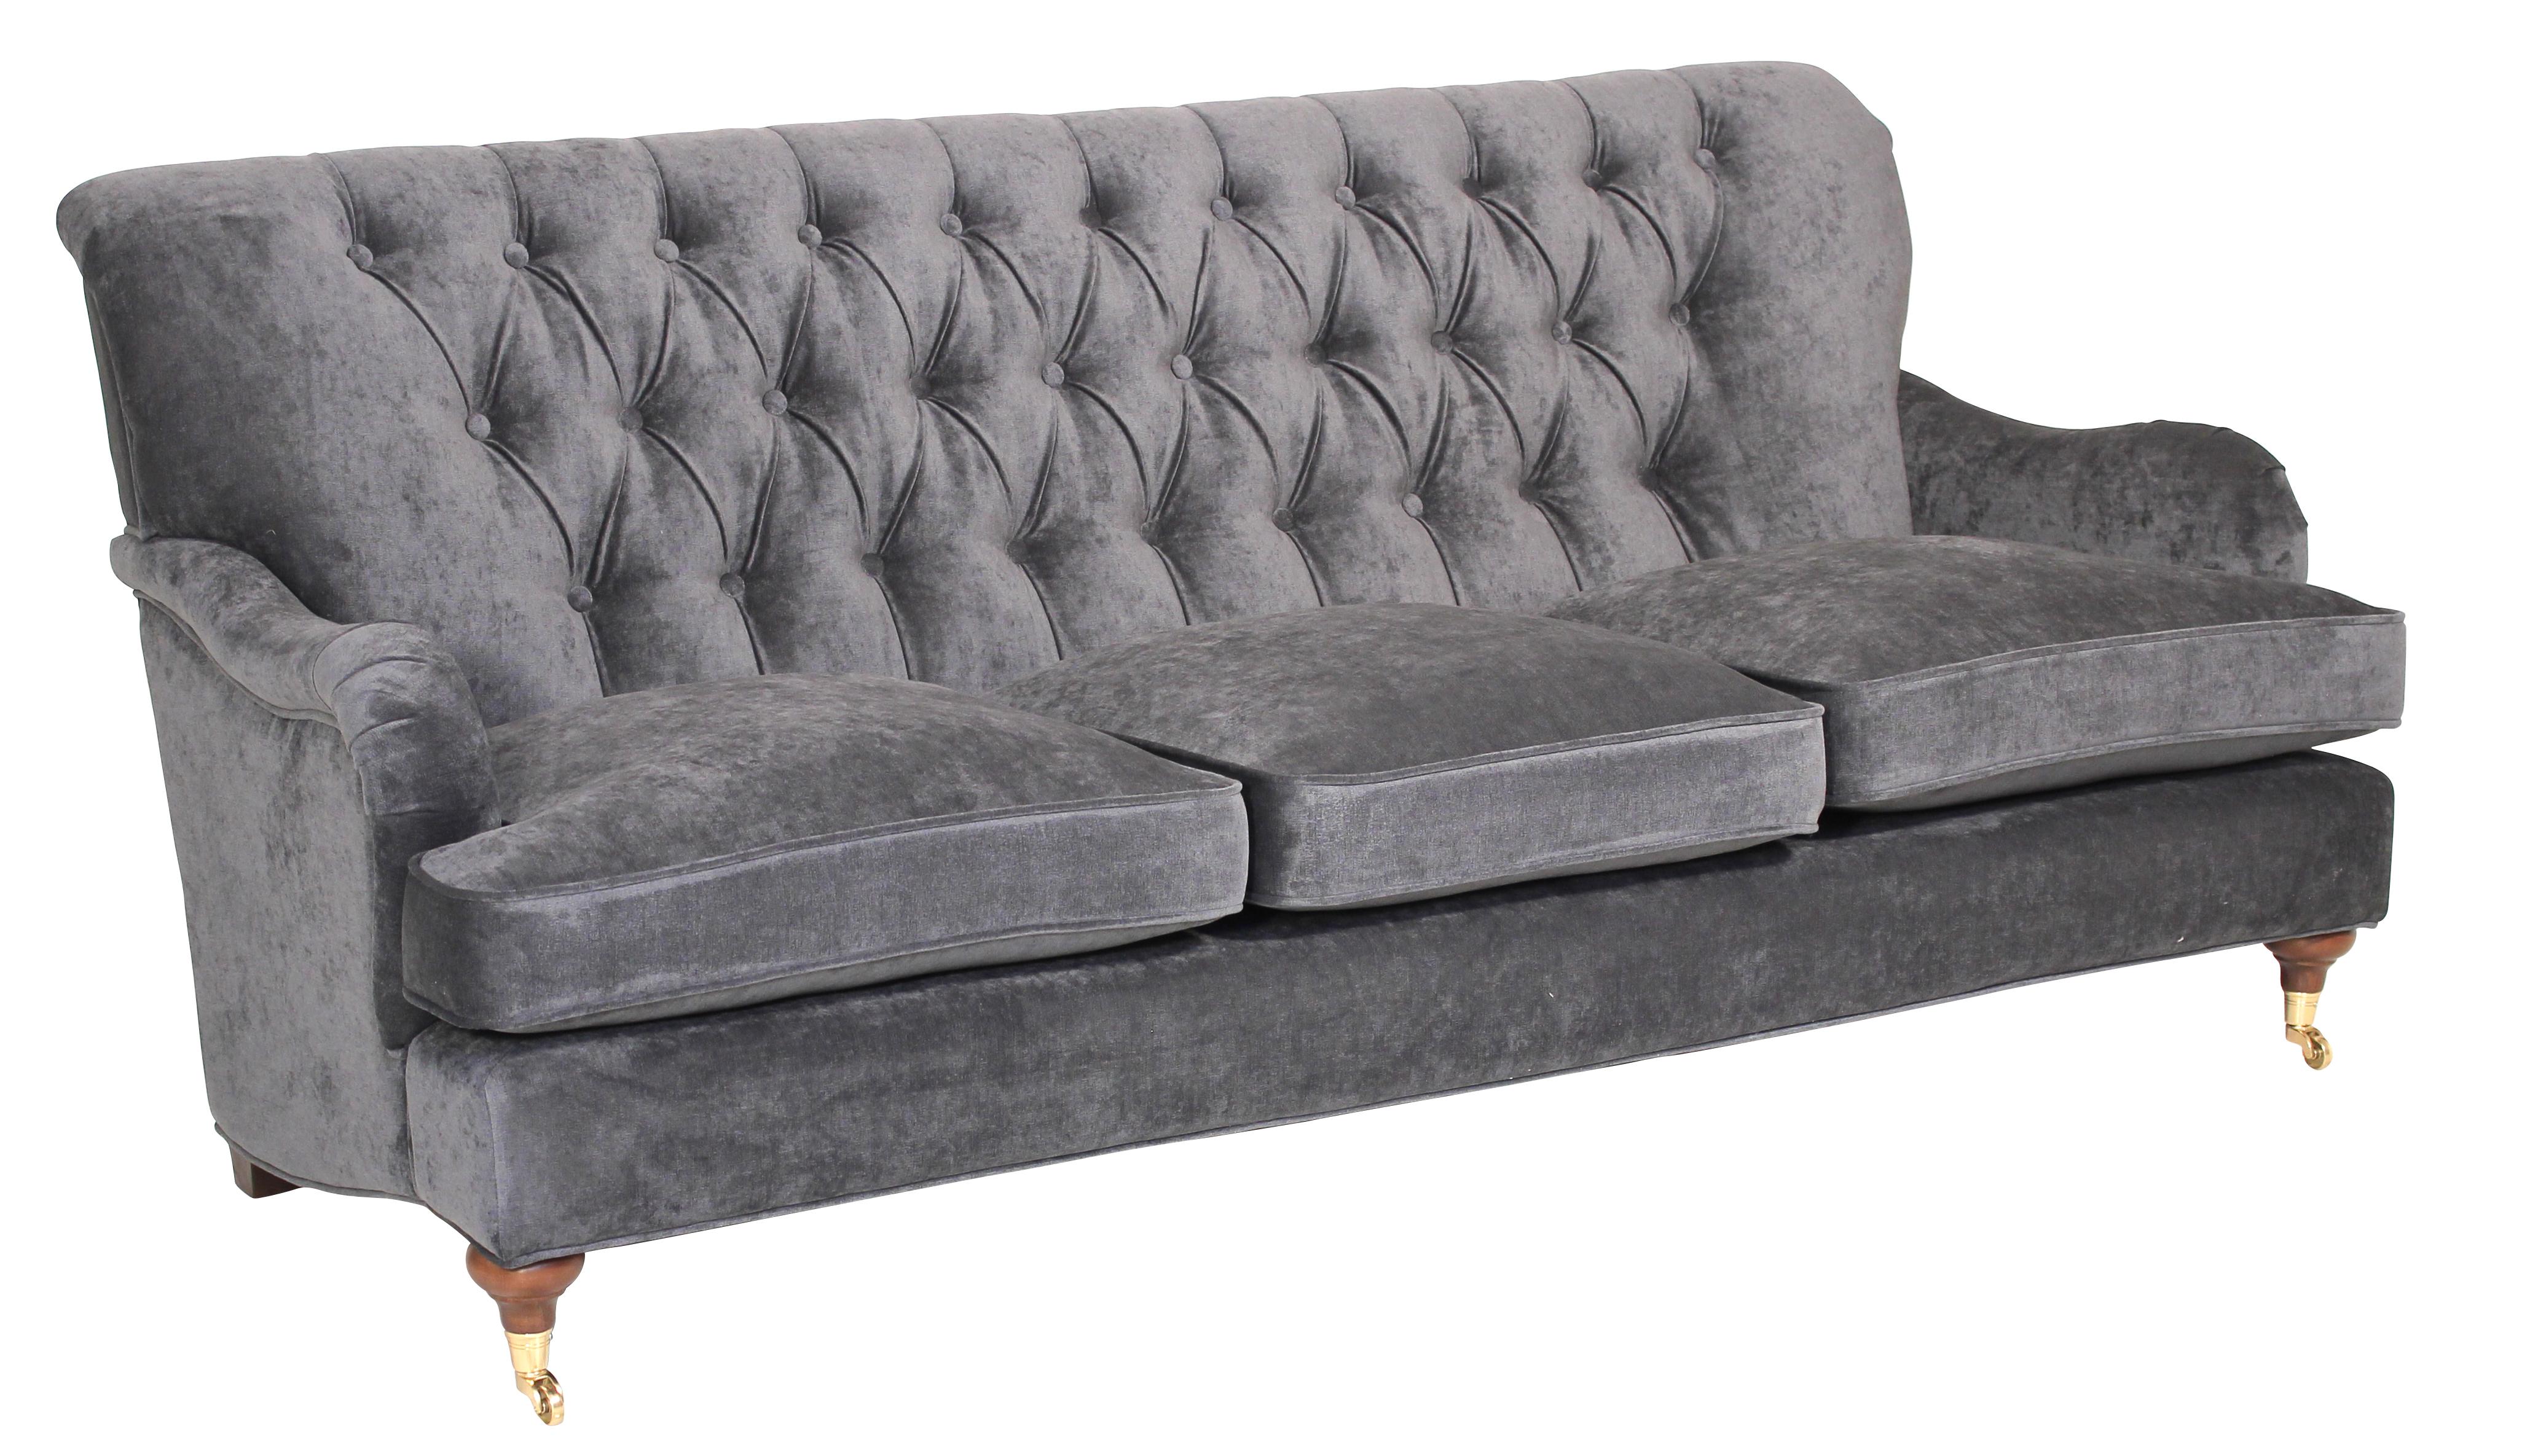 Soffa sammet